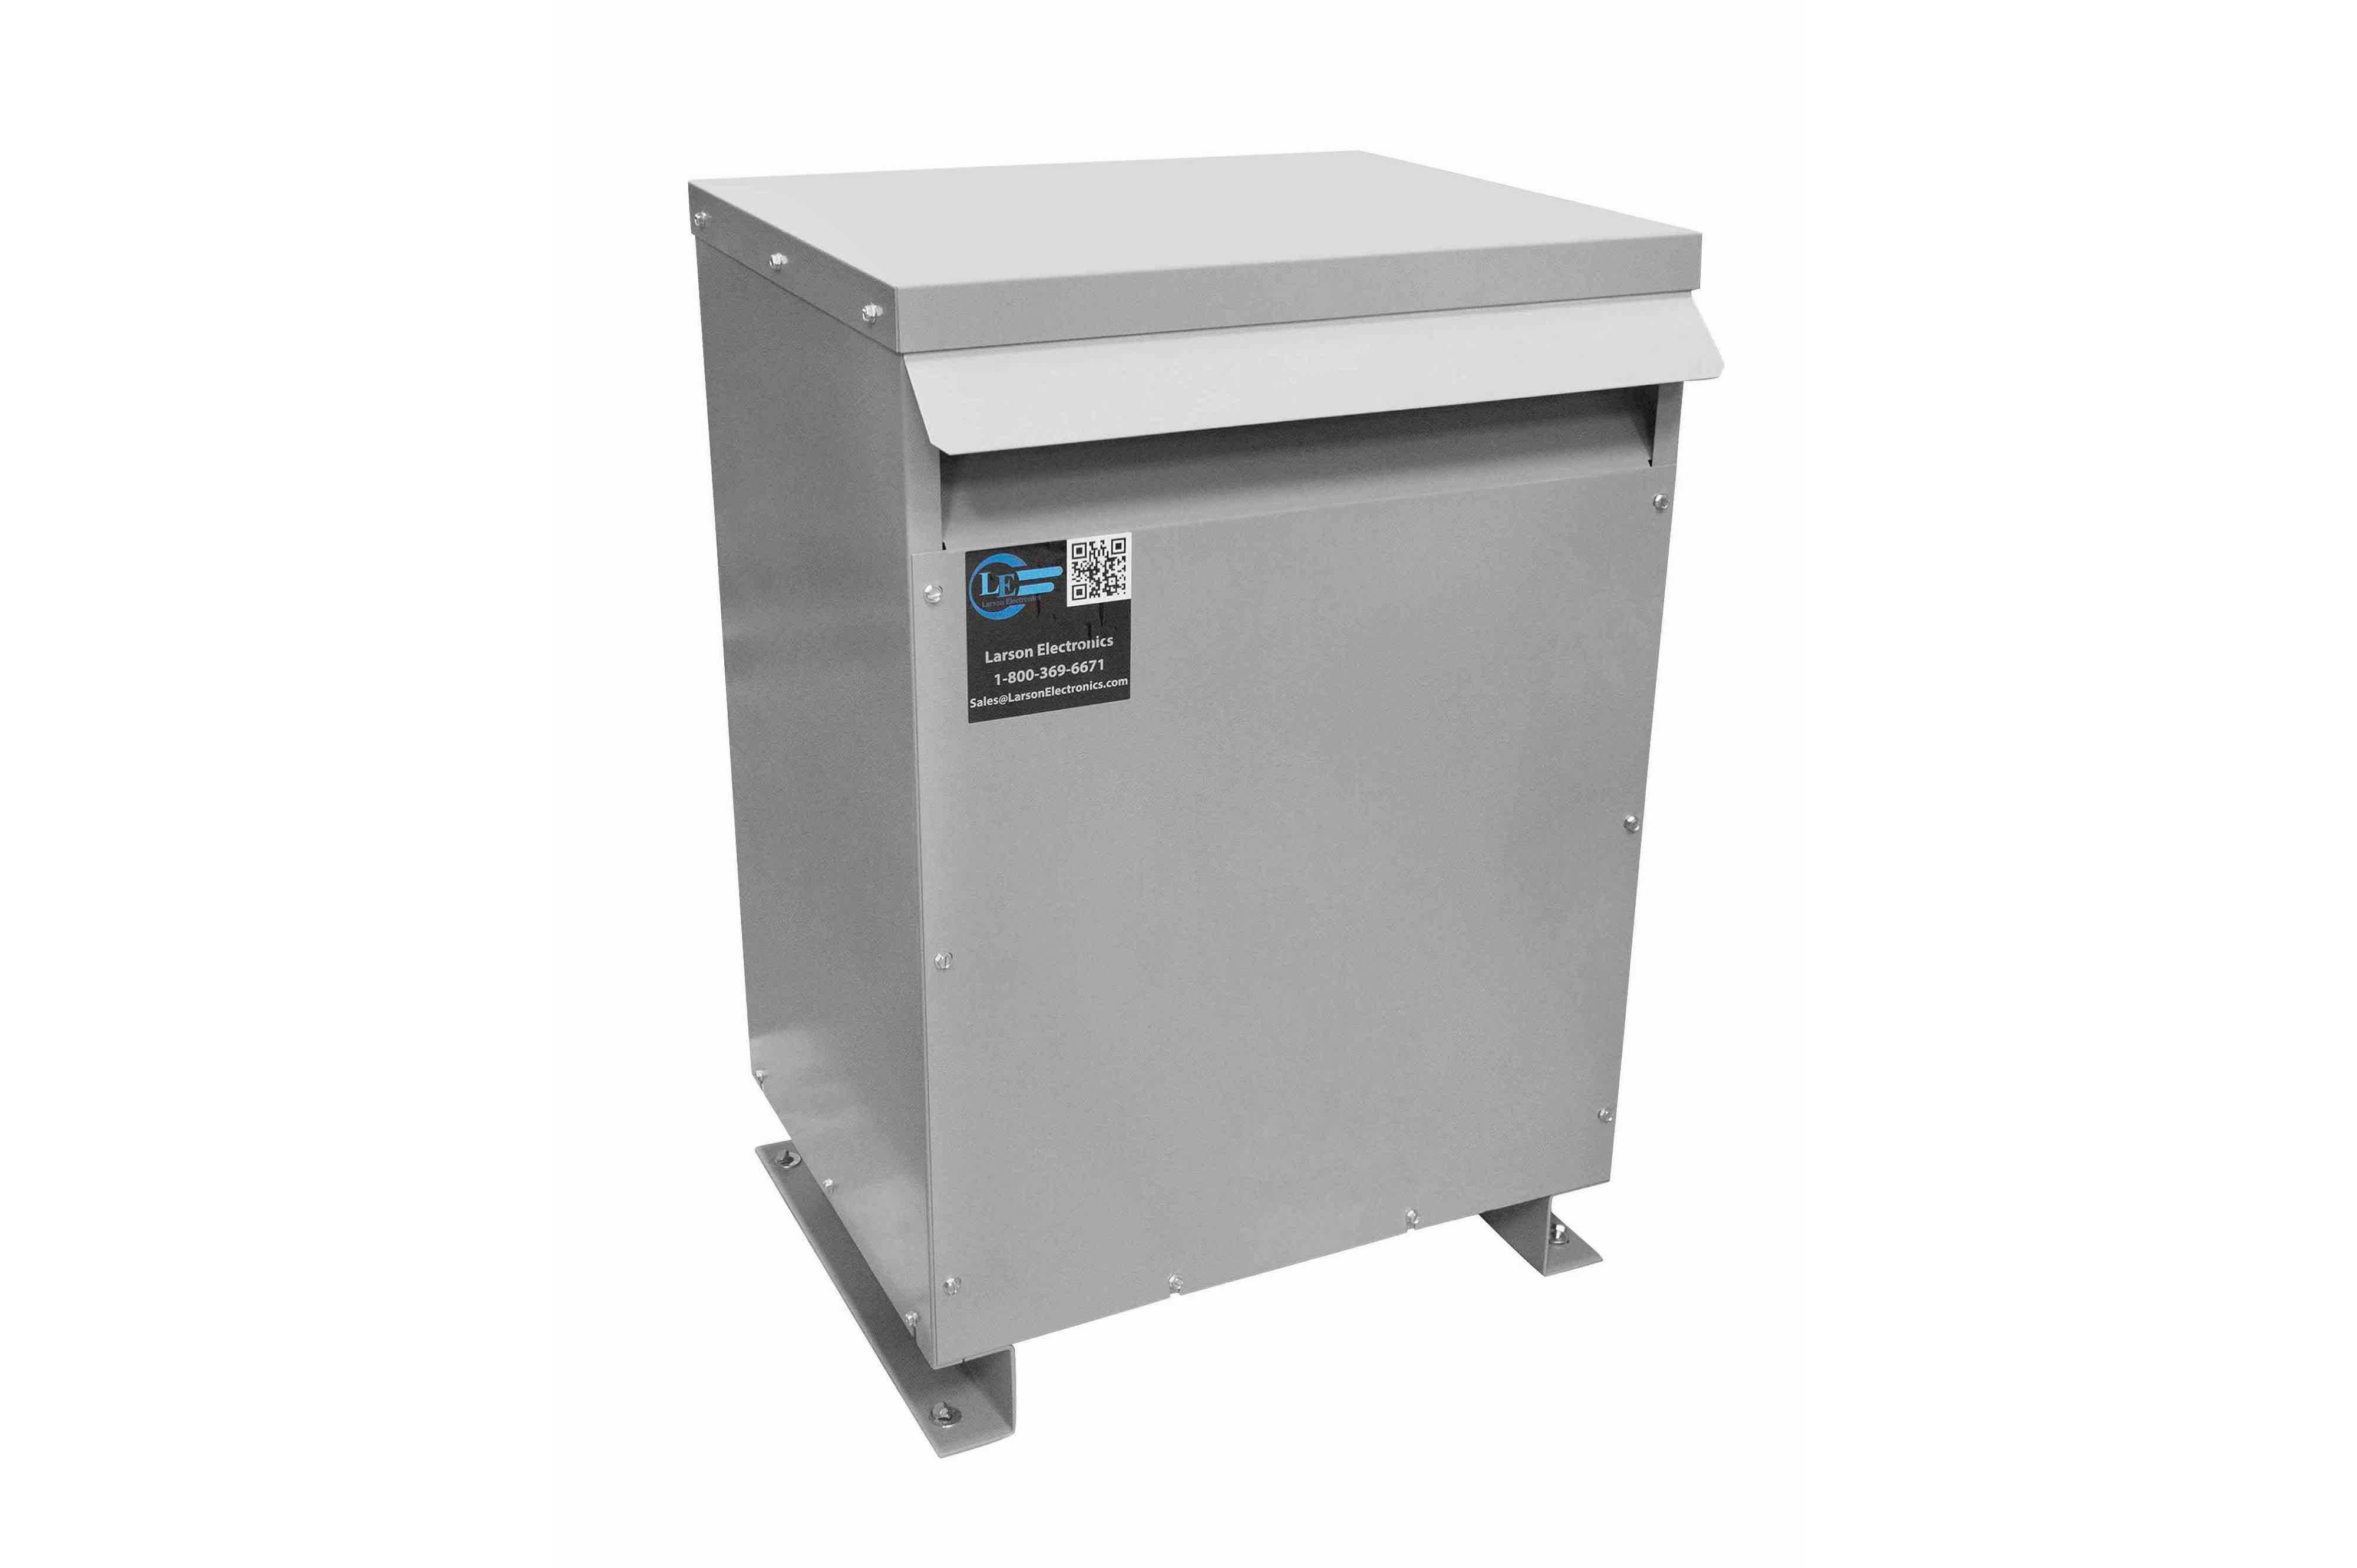 275 kVA 3PH Isolation Transformer, 460V Wye Primary, 208Y/120 Wye-N Secondary, N3R, Ventilated, 60 Hz